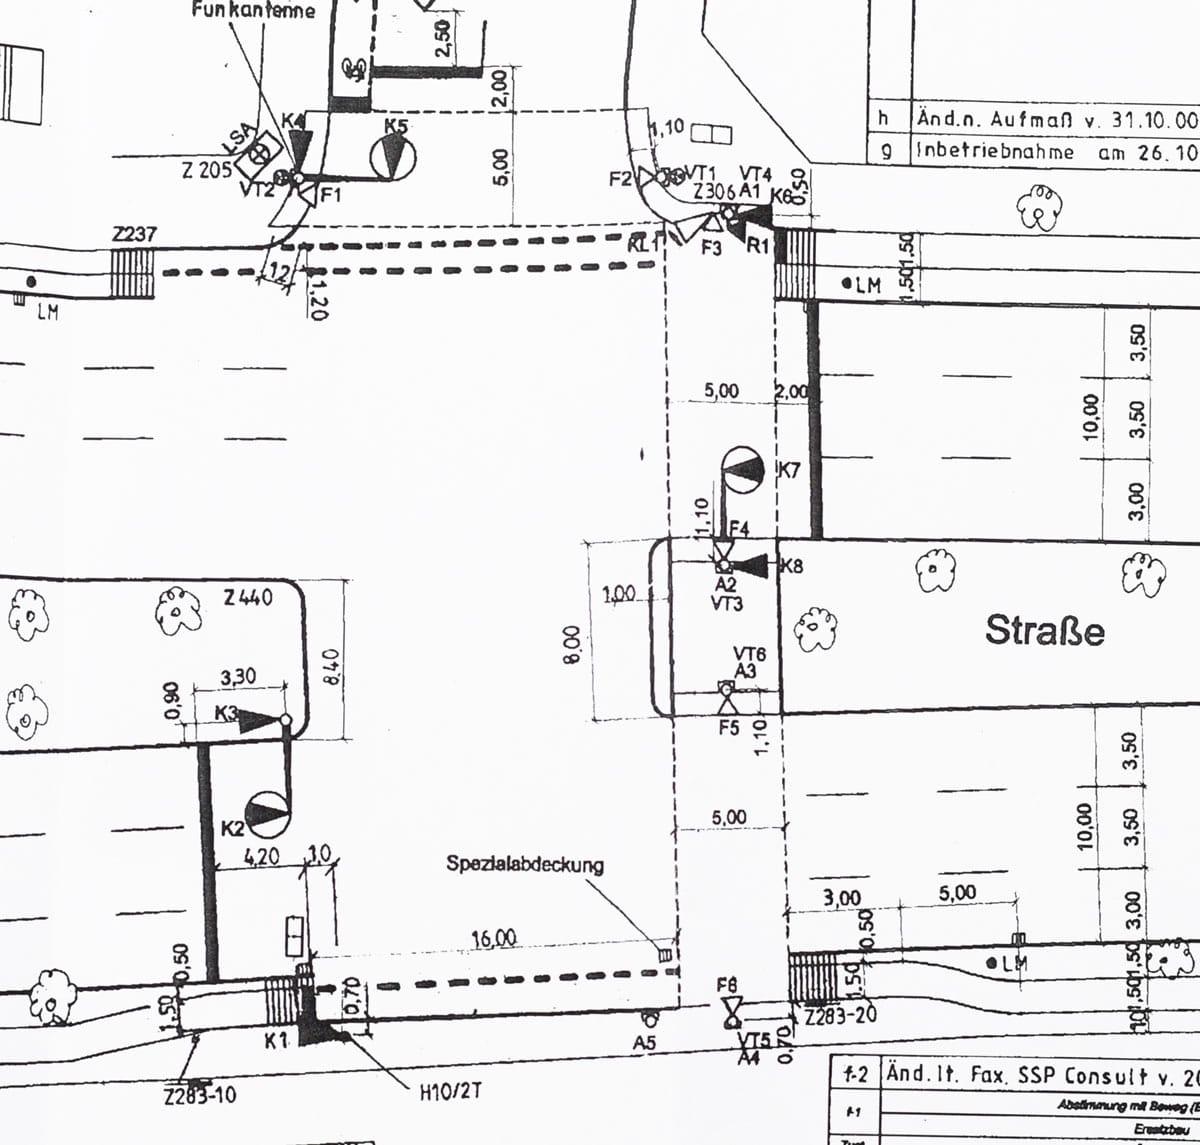 Ampelphase Phasenschaltung von Verkehrsampel Unfall Kreuzung rot gefahren